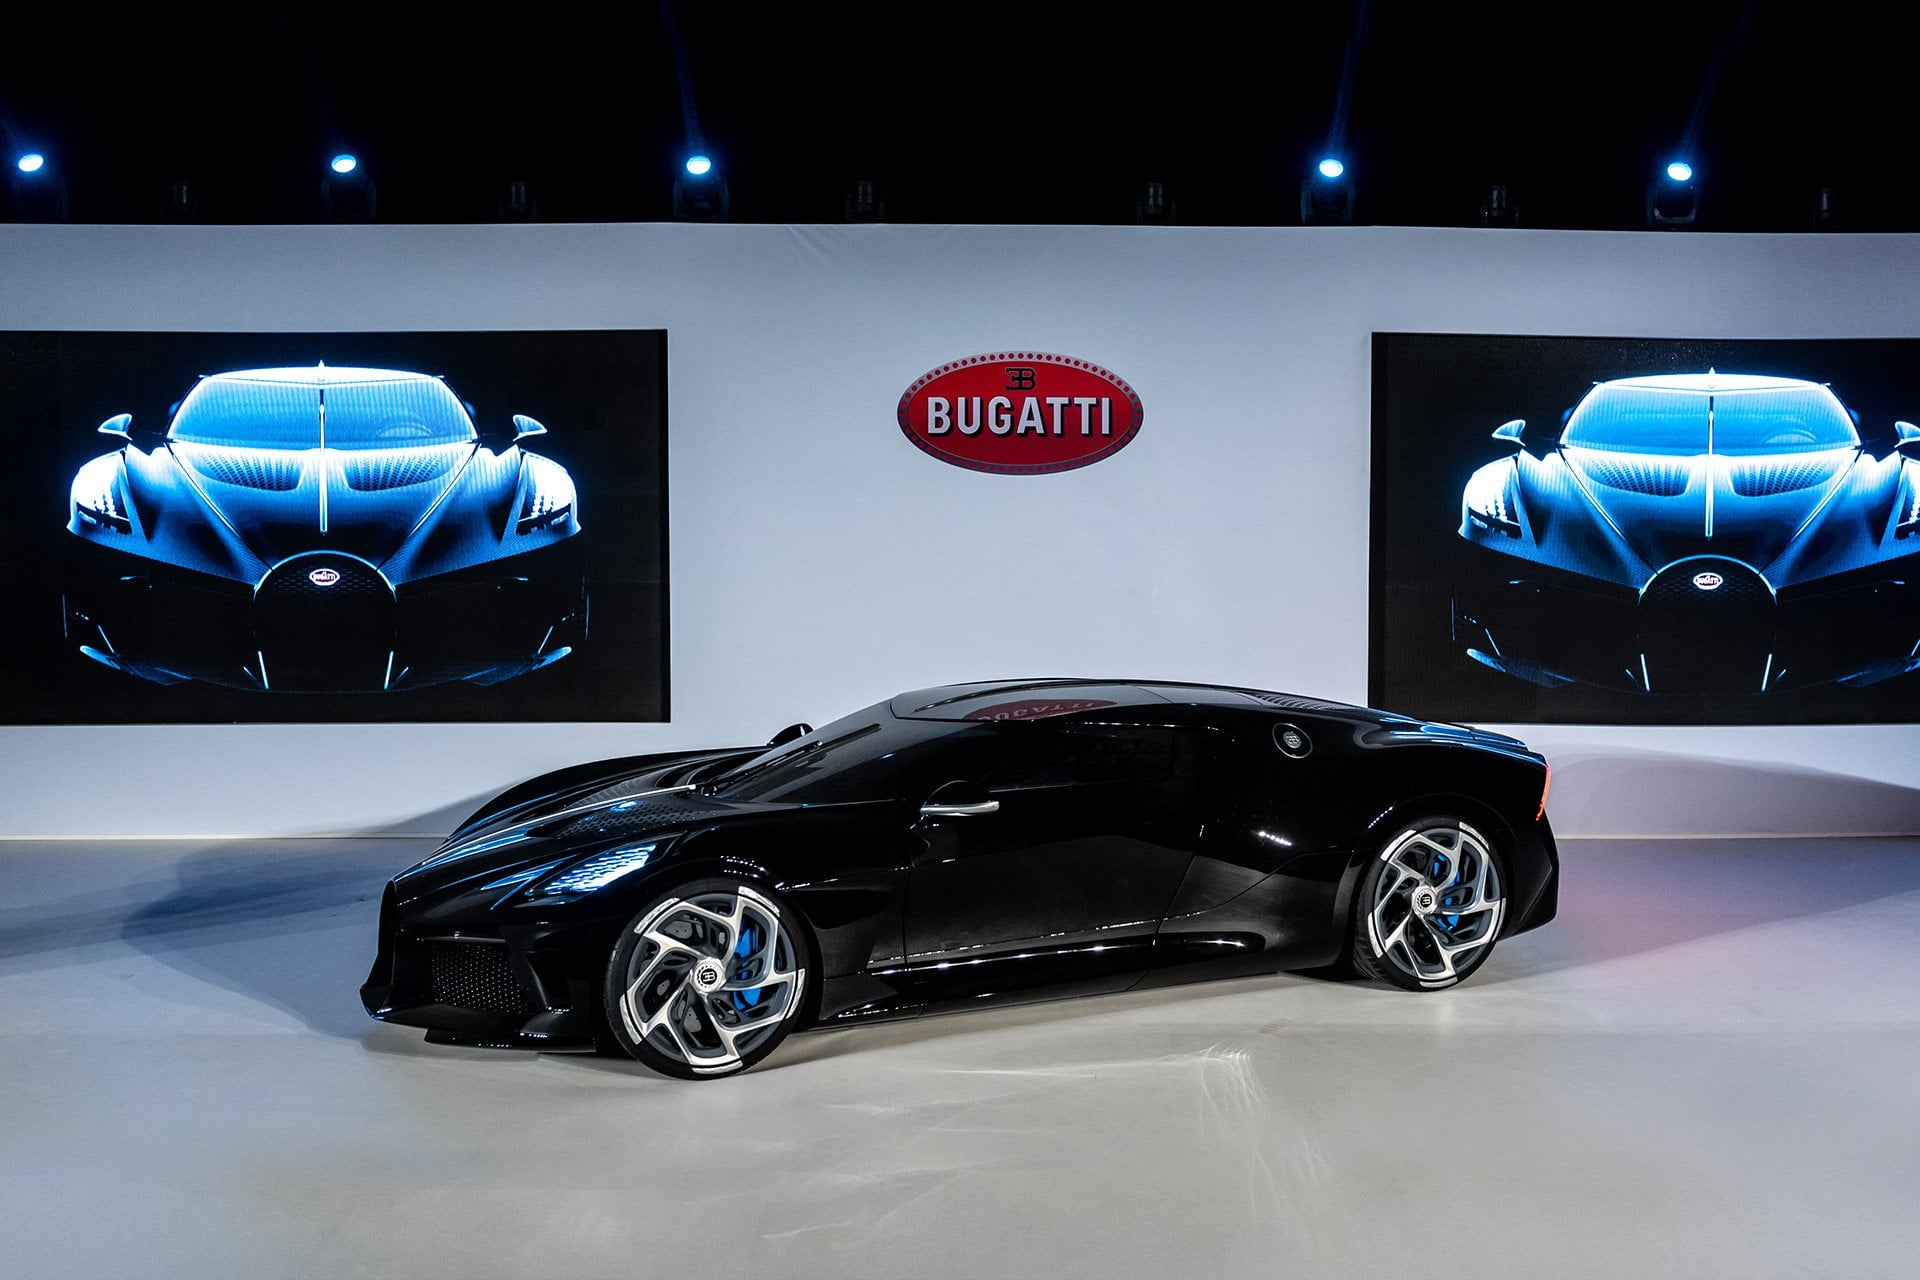 BugattiVoiture Noire